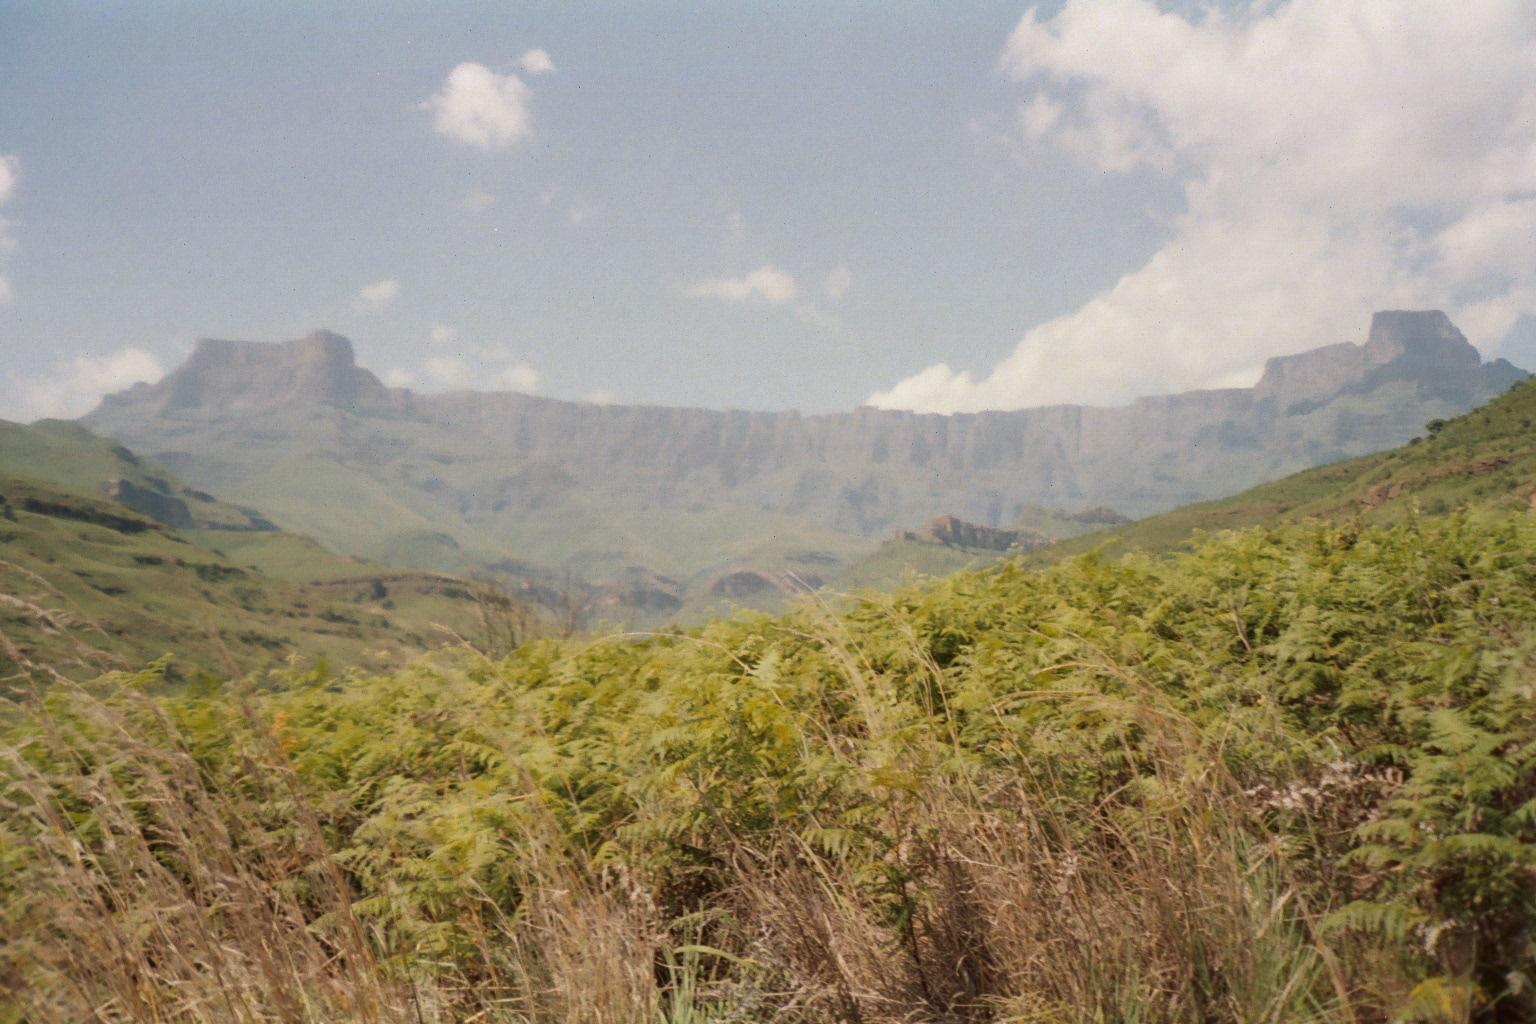 South Africa Zim 076.jpg